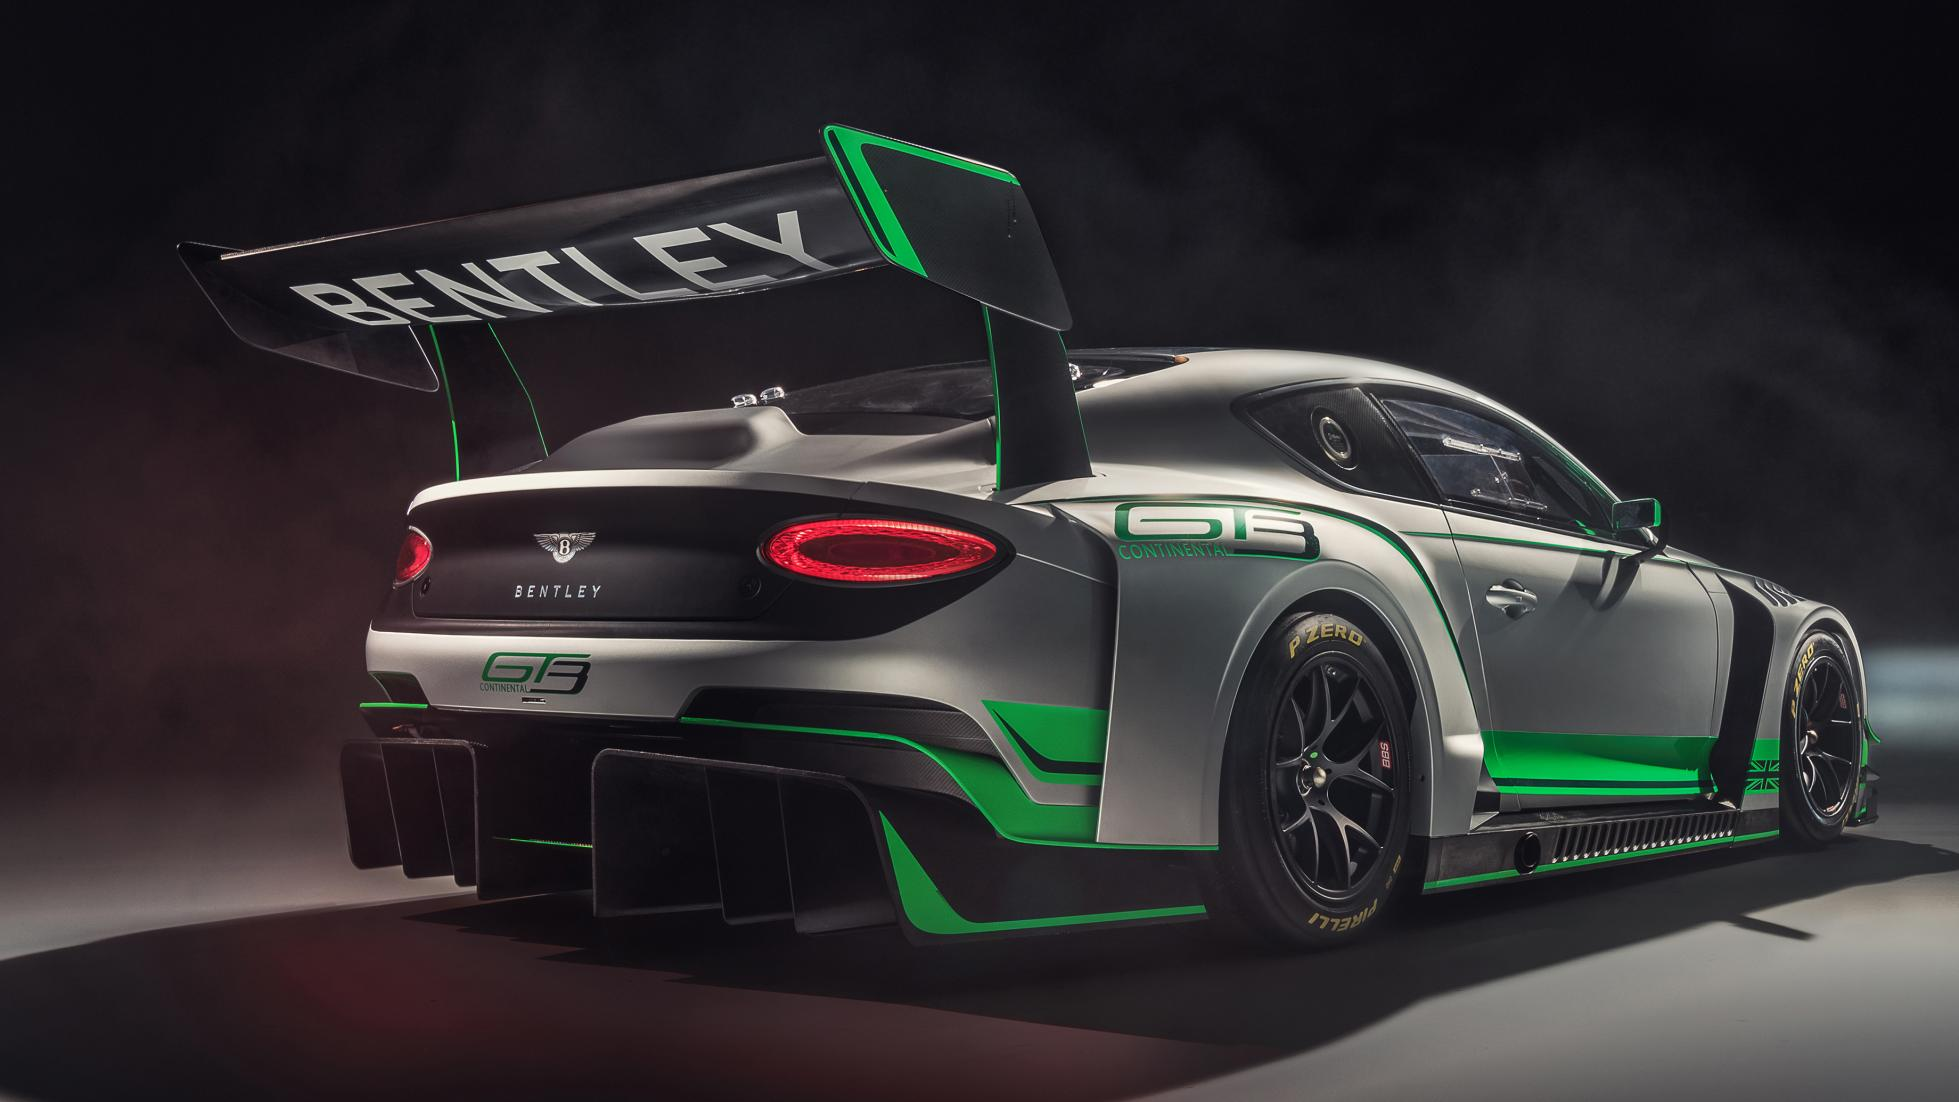 new bentley continental gt3   2 مشخصات نسخه مسابقهای کانتیننتال GT3   اجاره ماشین